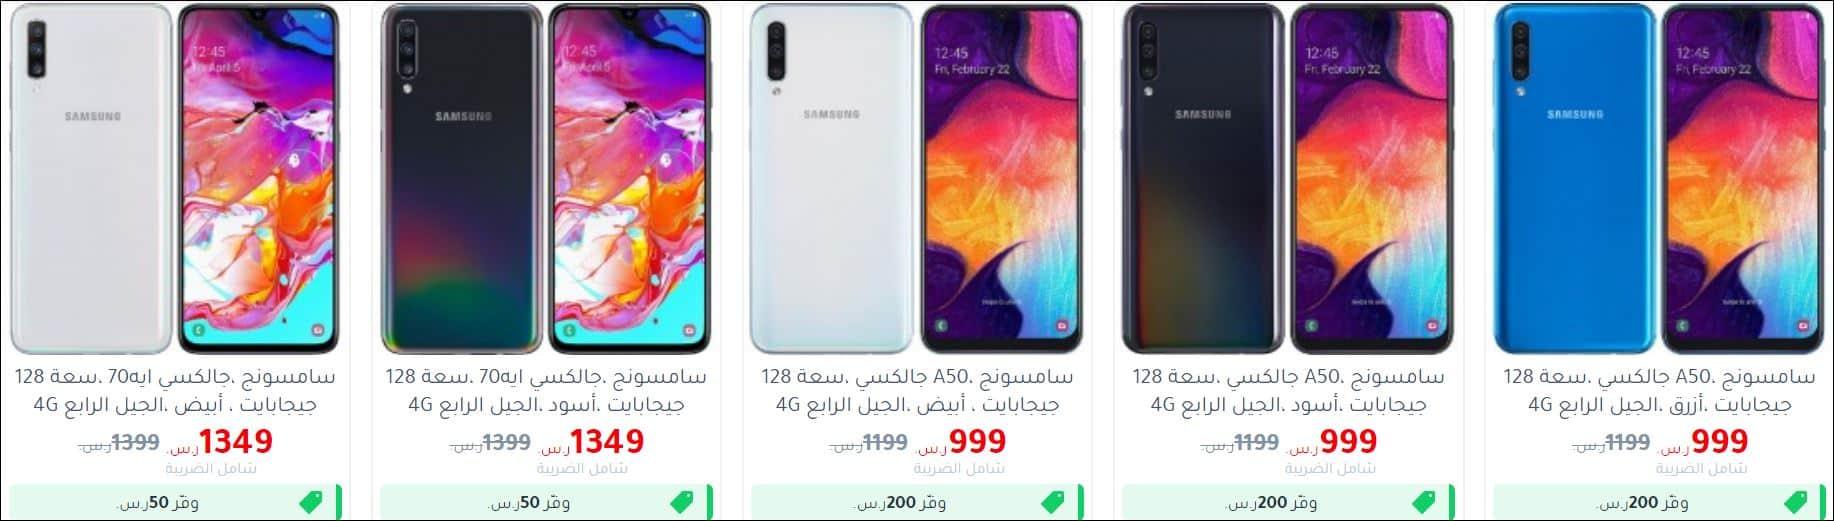 jarir mobile offers سامسونج جالكسي ايه 50 و ايه 7